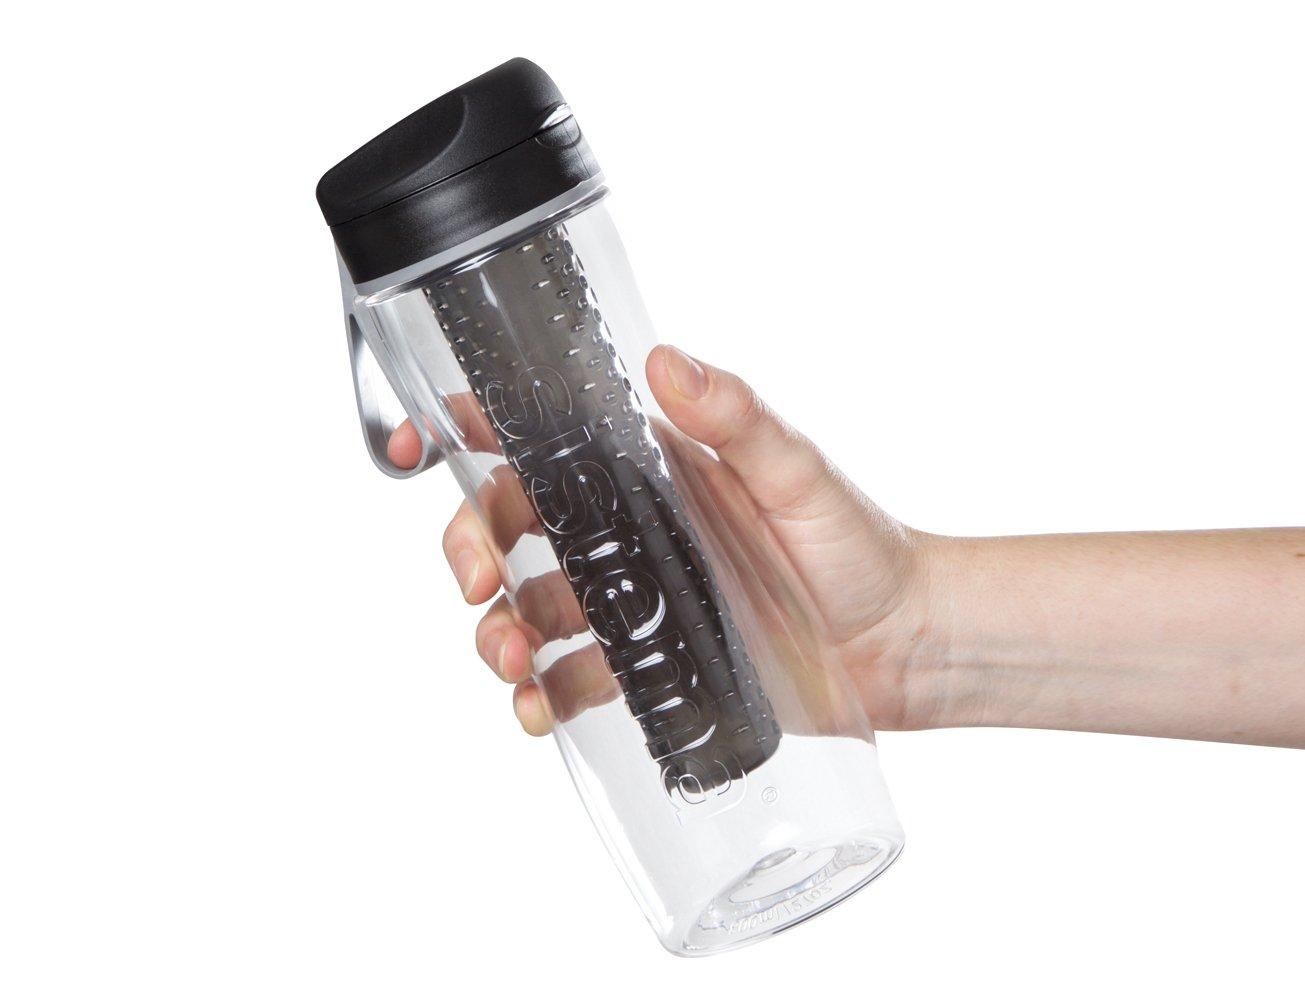 con infusor de frutas 800 ml 9.5 x 8.1 x 23.5 cm Sistema Hidrato Tritan/ /Botella Negro